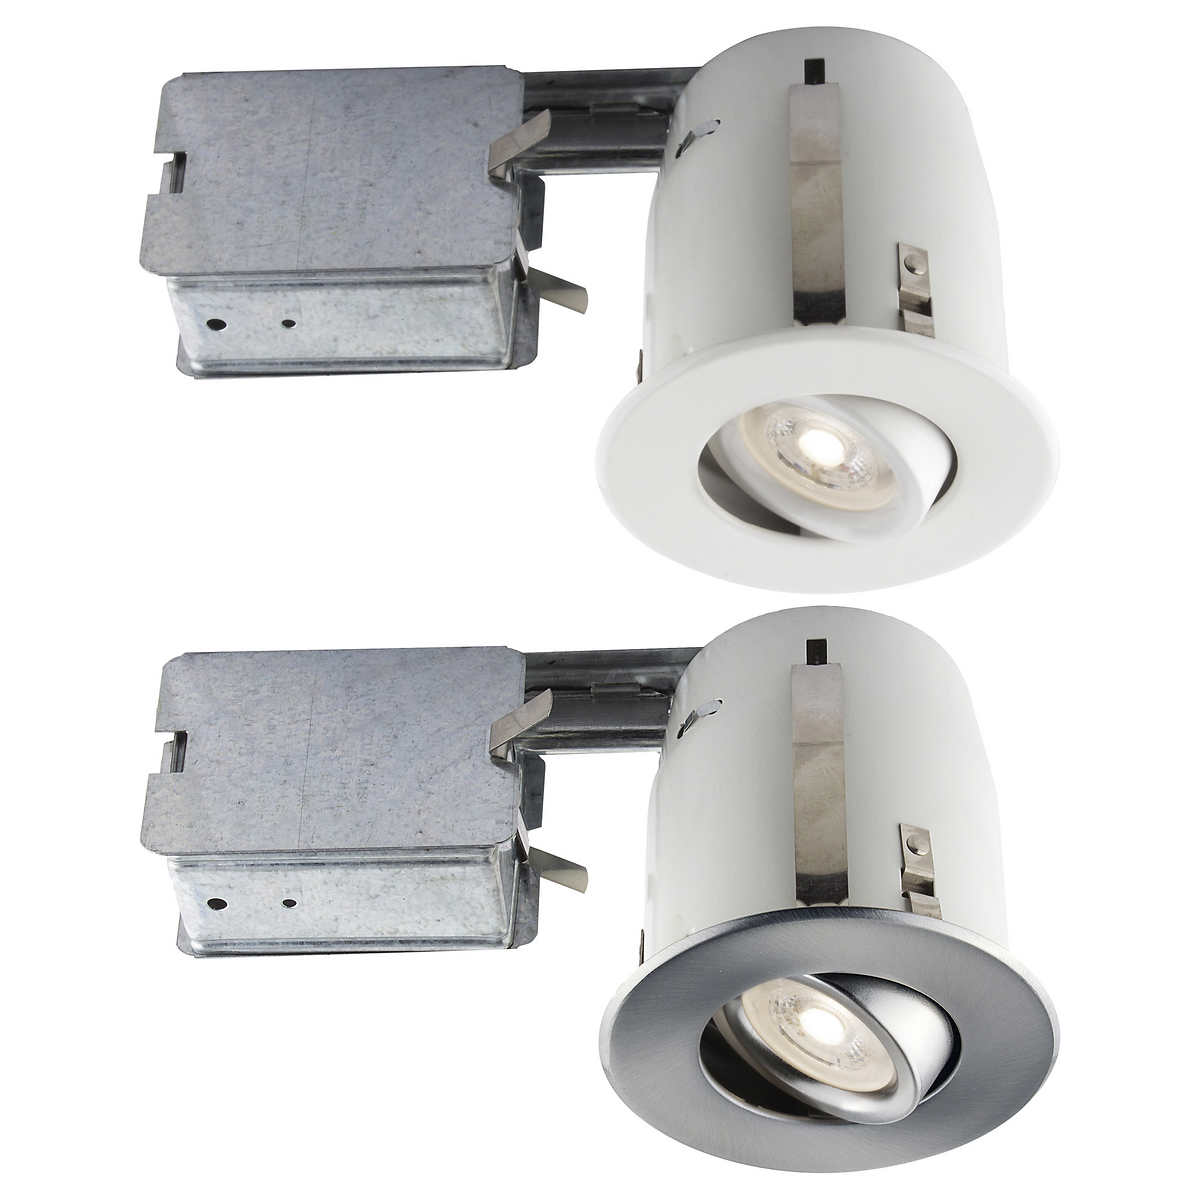 Recessed LED Lighting Kit GU10  4 packRecessed Lighting   Costco. Recessed Led Lighting Fixtures Canada. Home Design Ideas